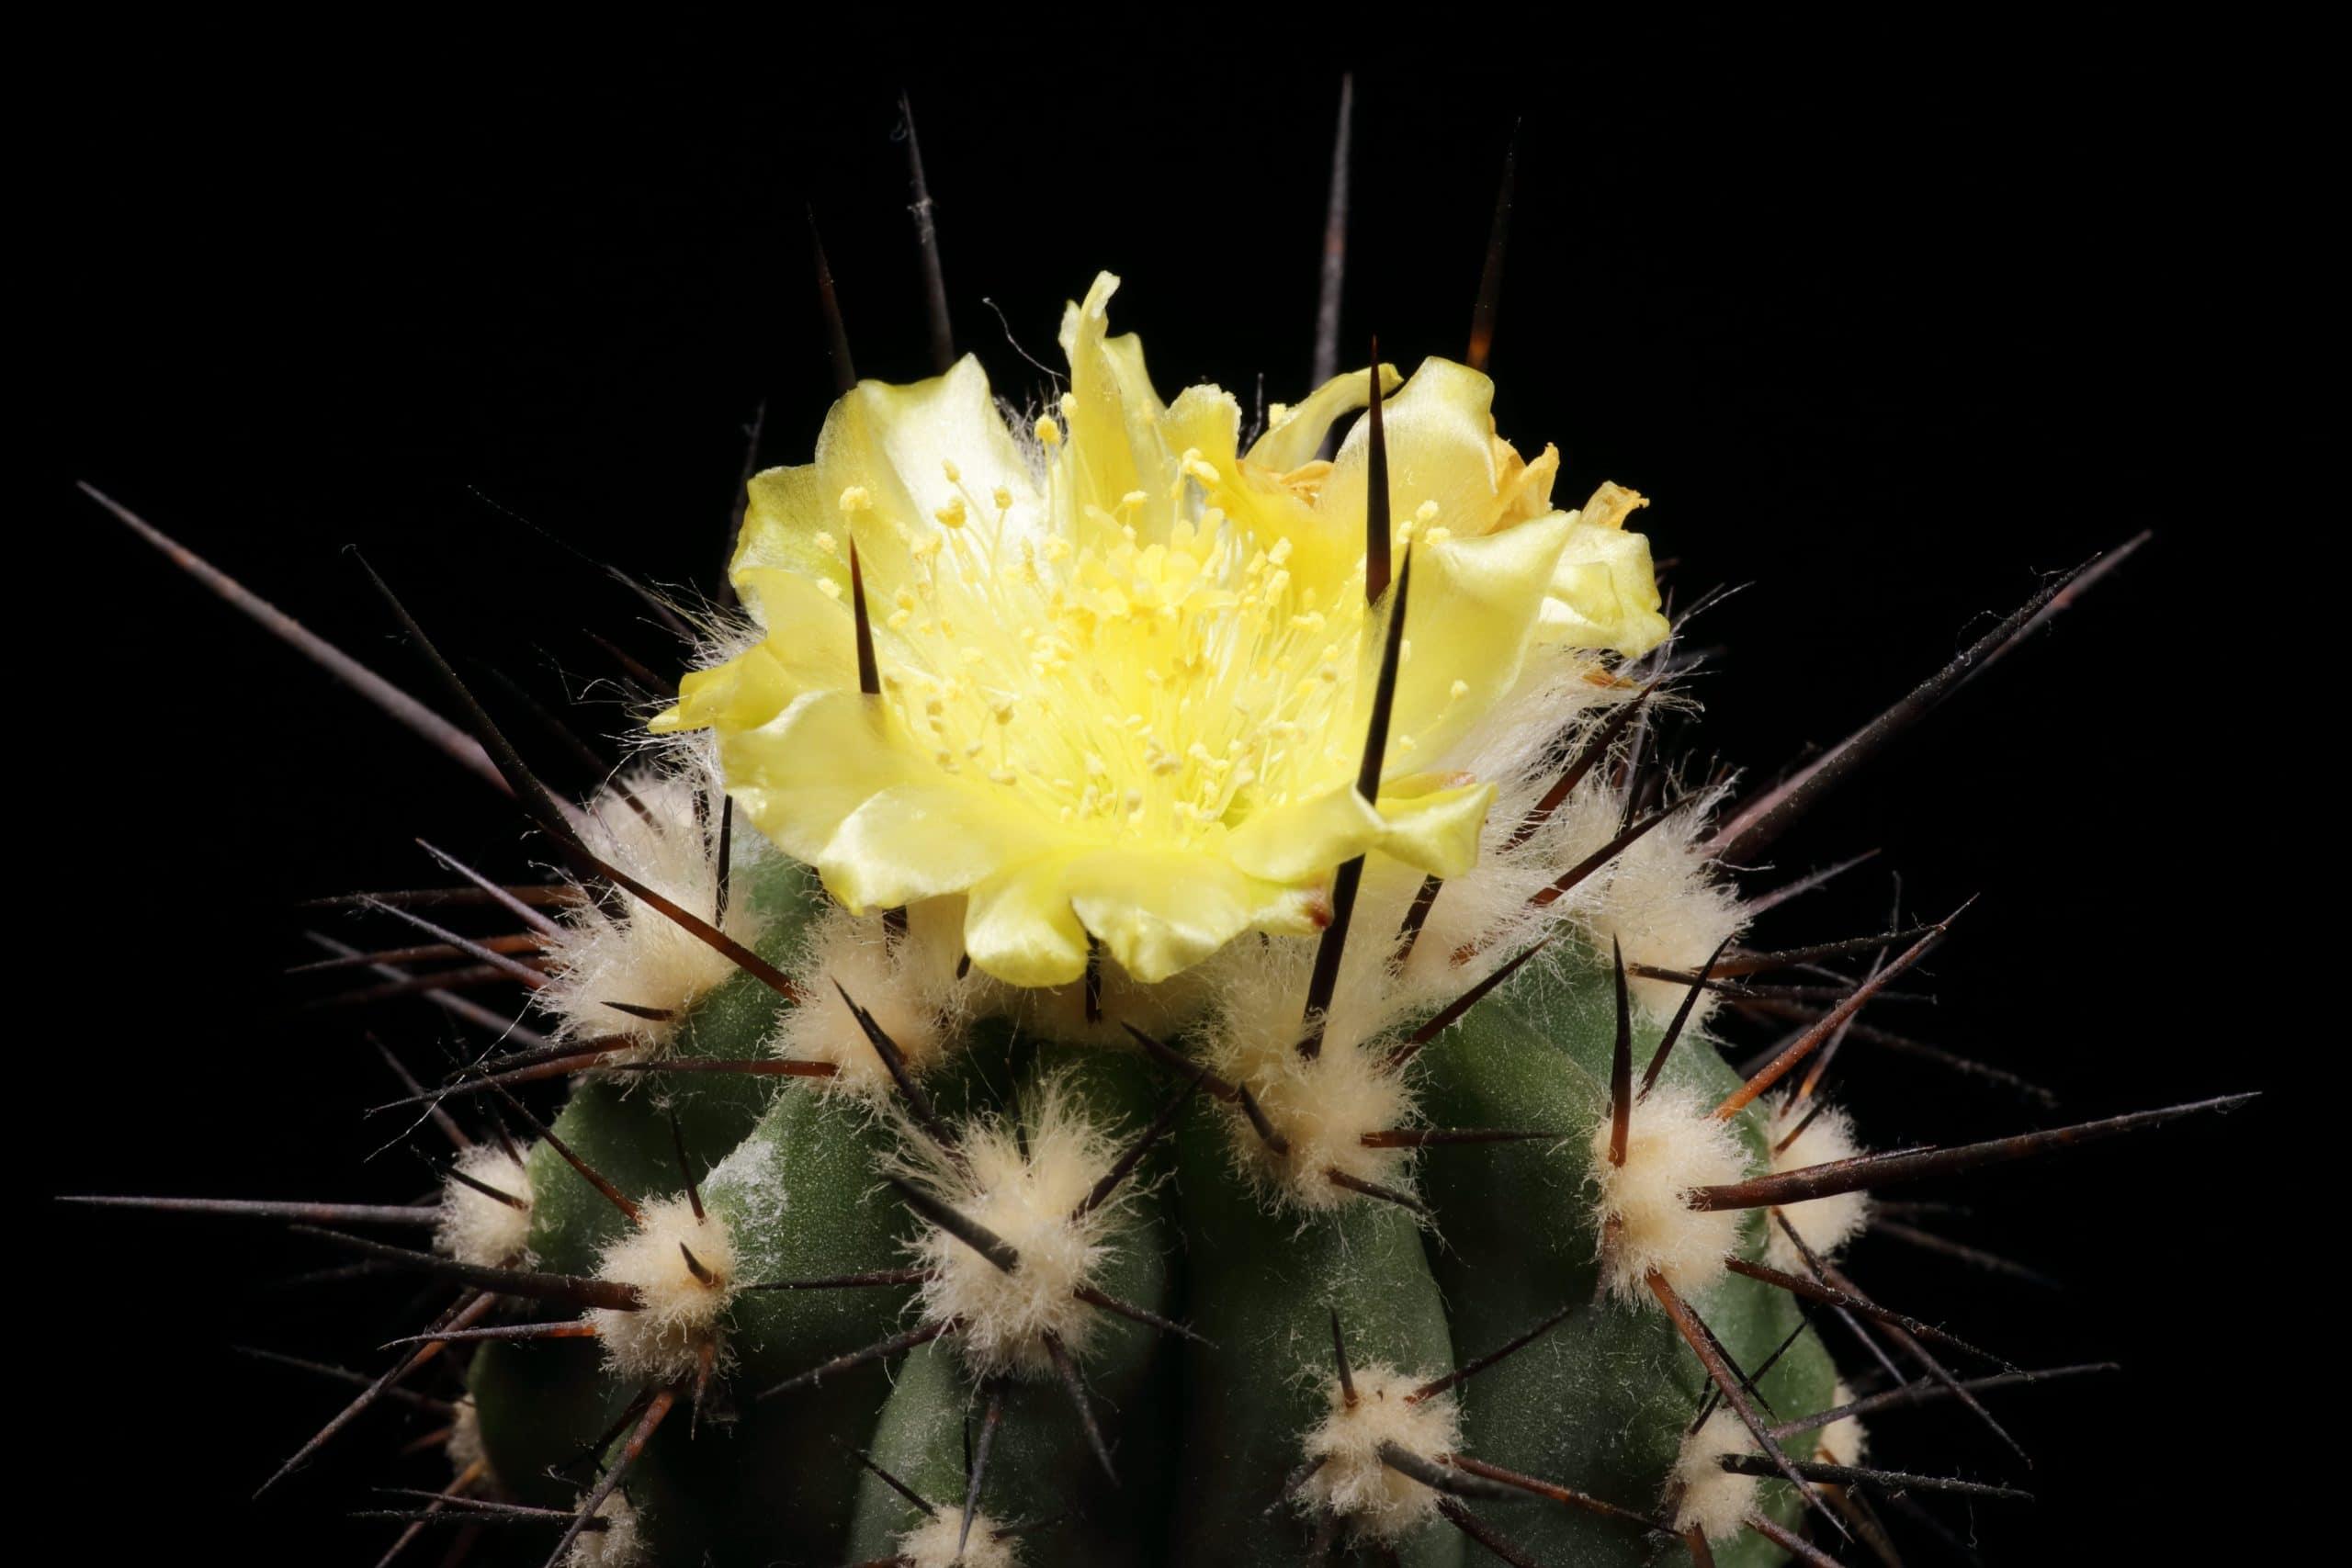 Copiapoa calderana en flor